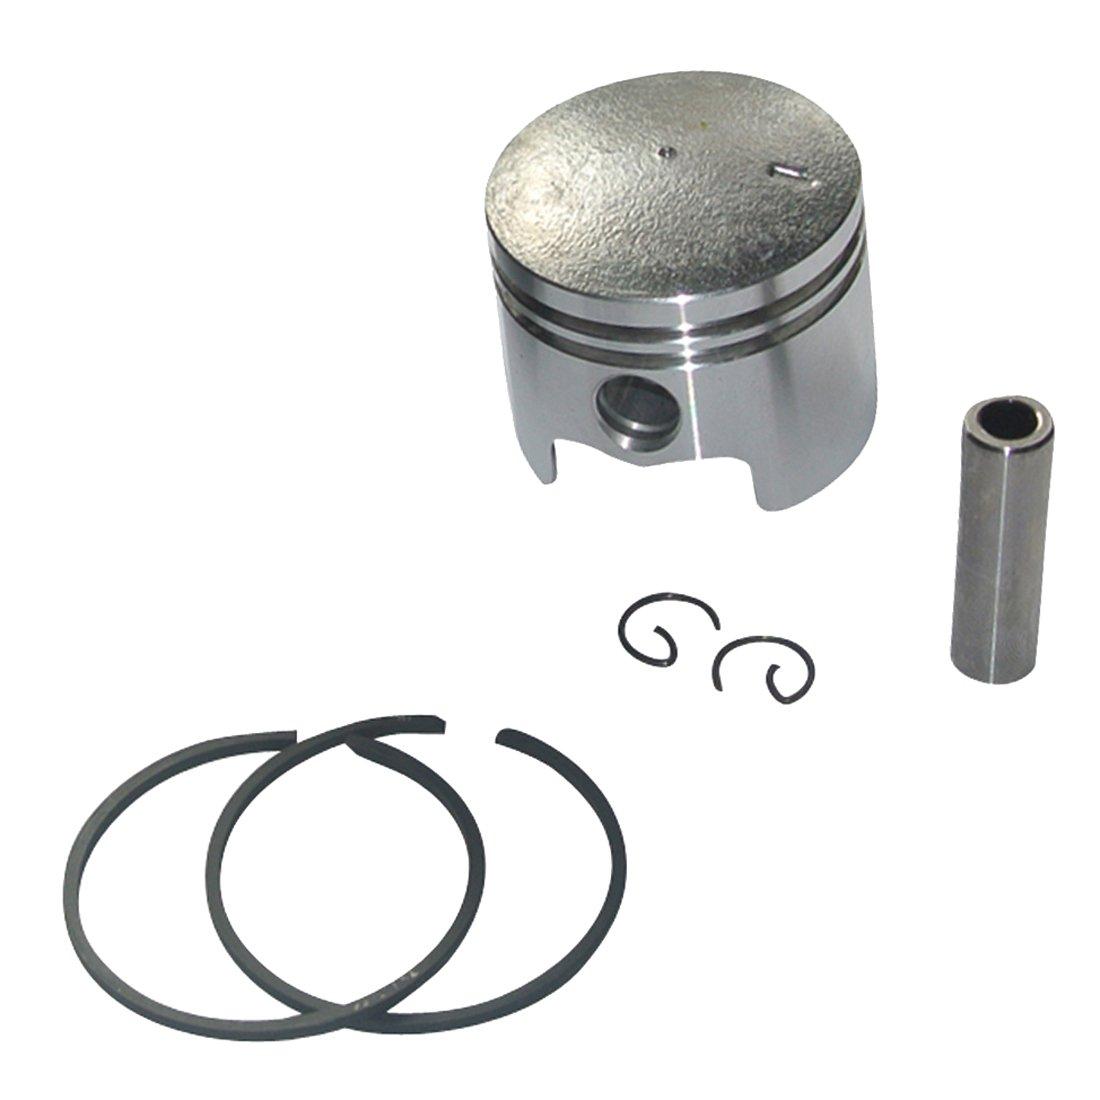 Sthus 44mm Cylinder Piston Kit For Mitsubishi TL52 Engine Motor BG520 Bushcutter by Sthus (Image #3)